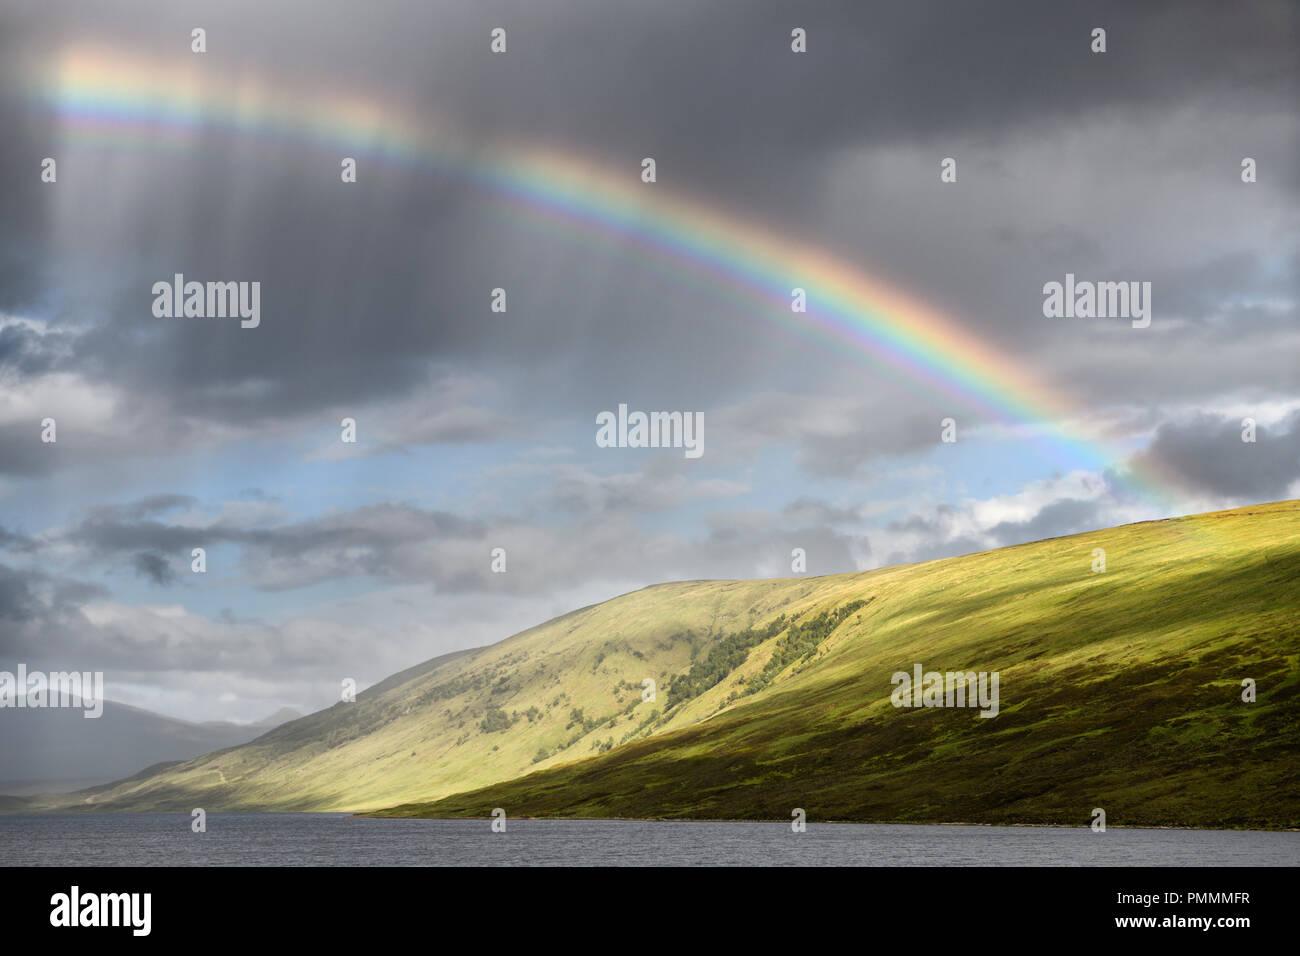 Rainbow and dark clouds over Loch a Chroisg ending at An Liathanach Hill near Badavanich Scottish Highlands Scotland UK - Stock Image